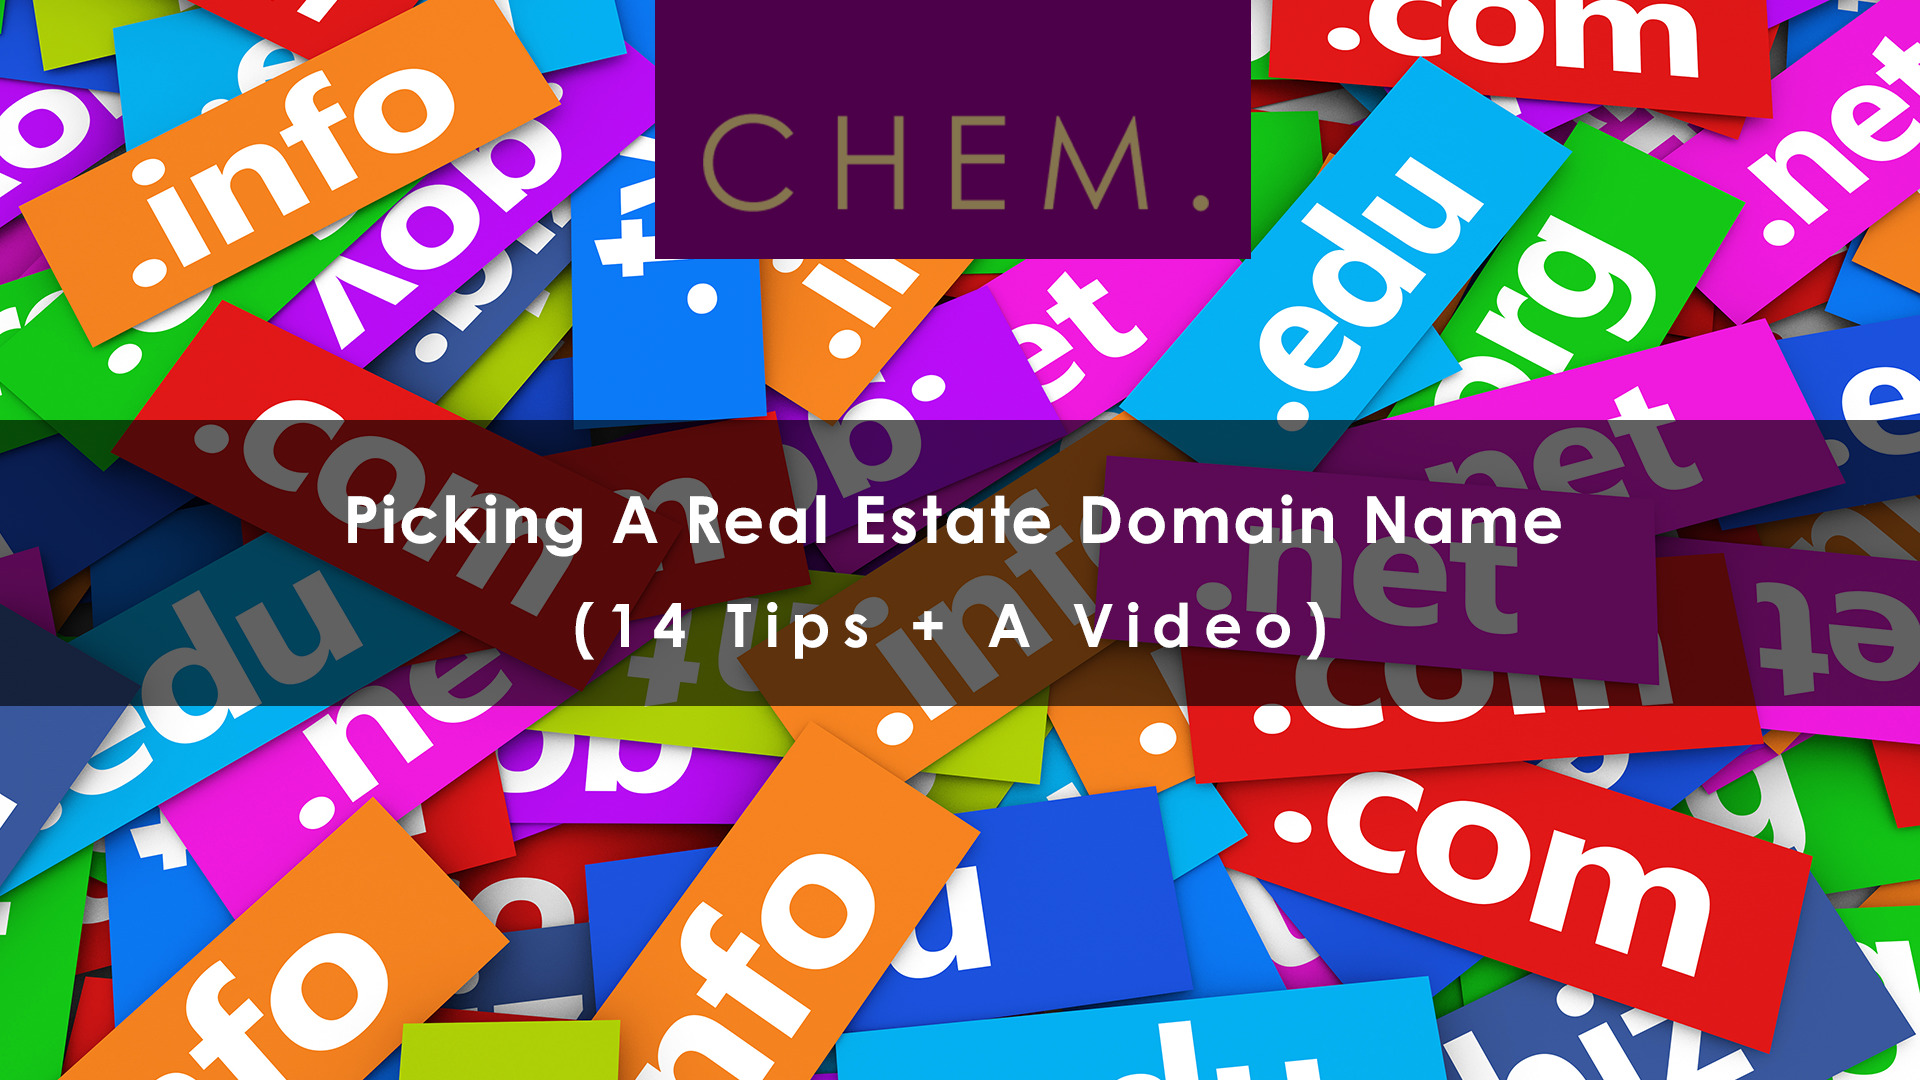 Picking A Real Estate Domain Name